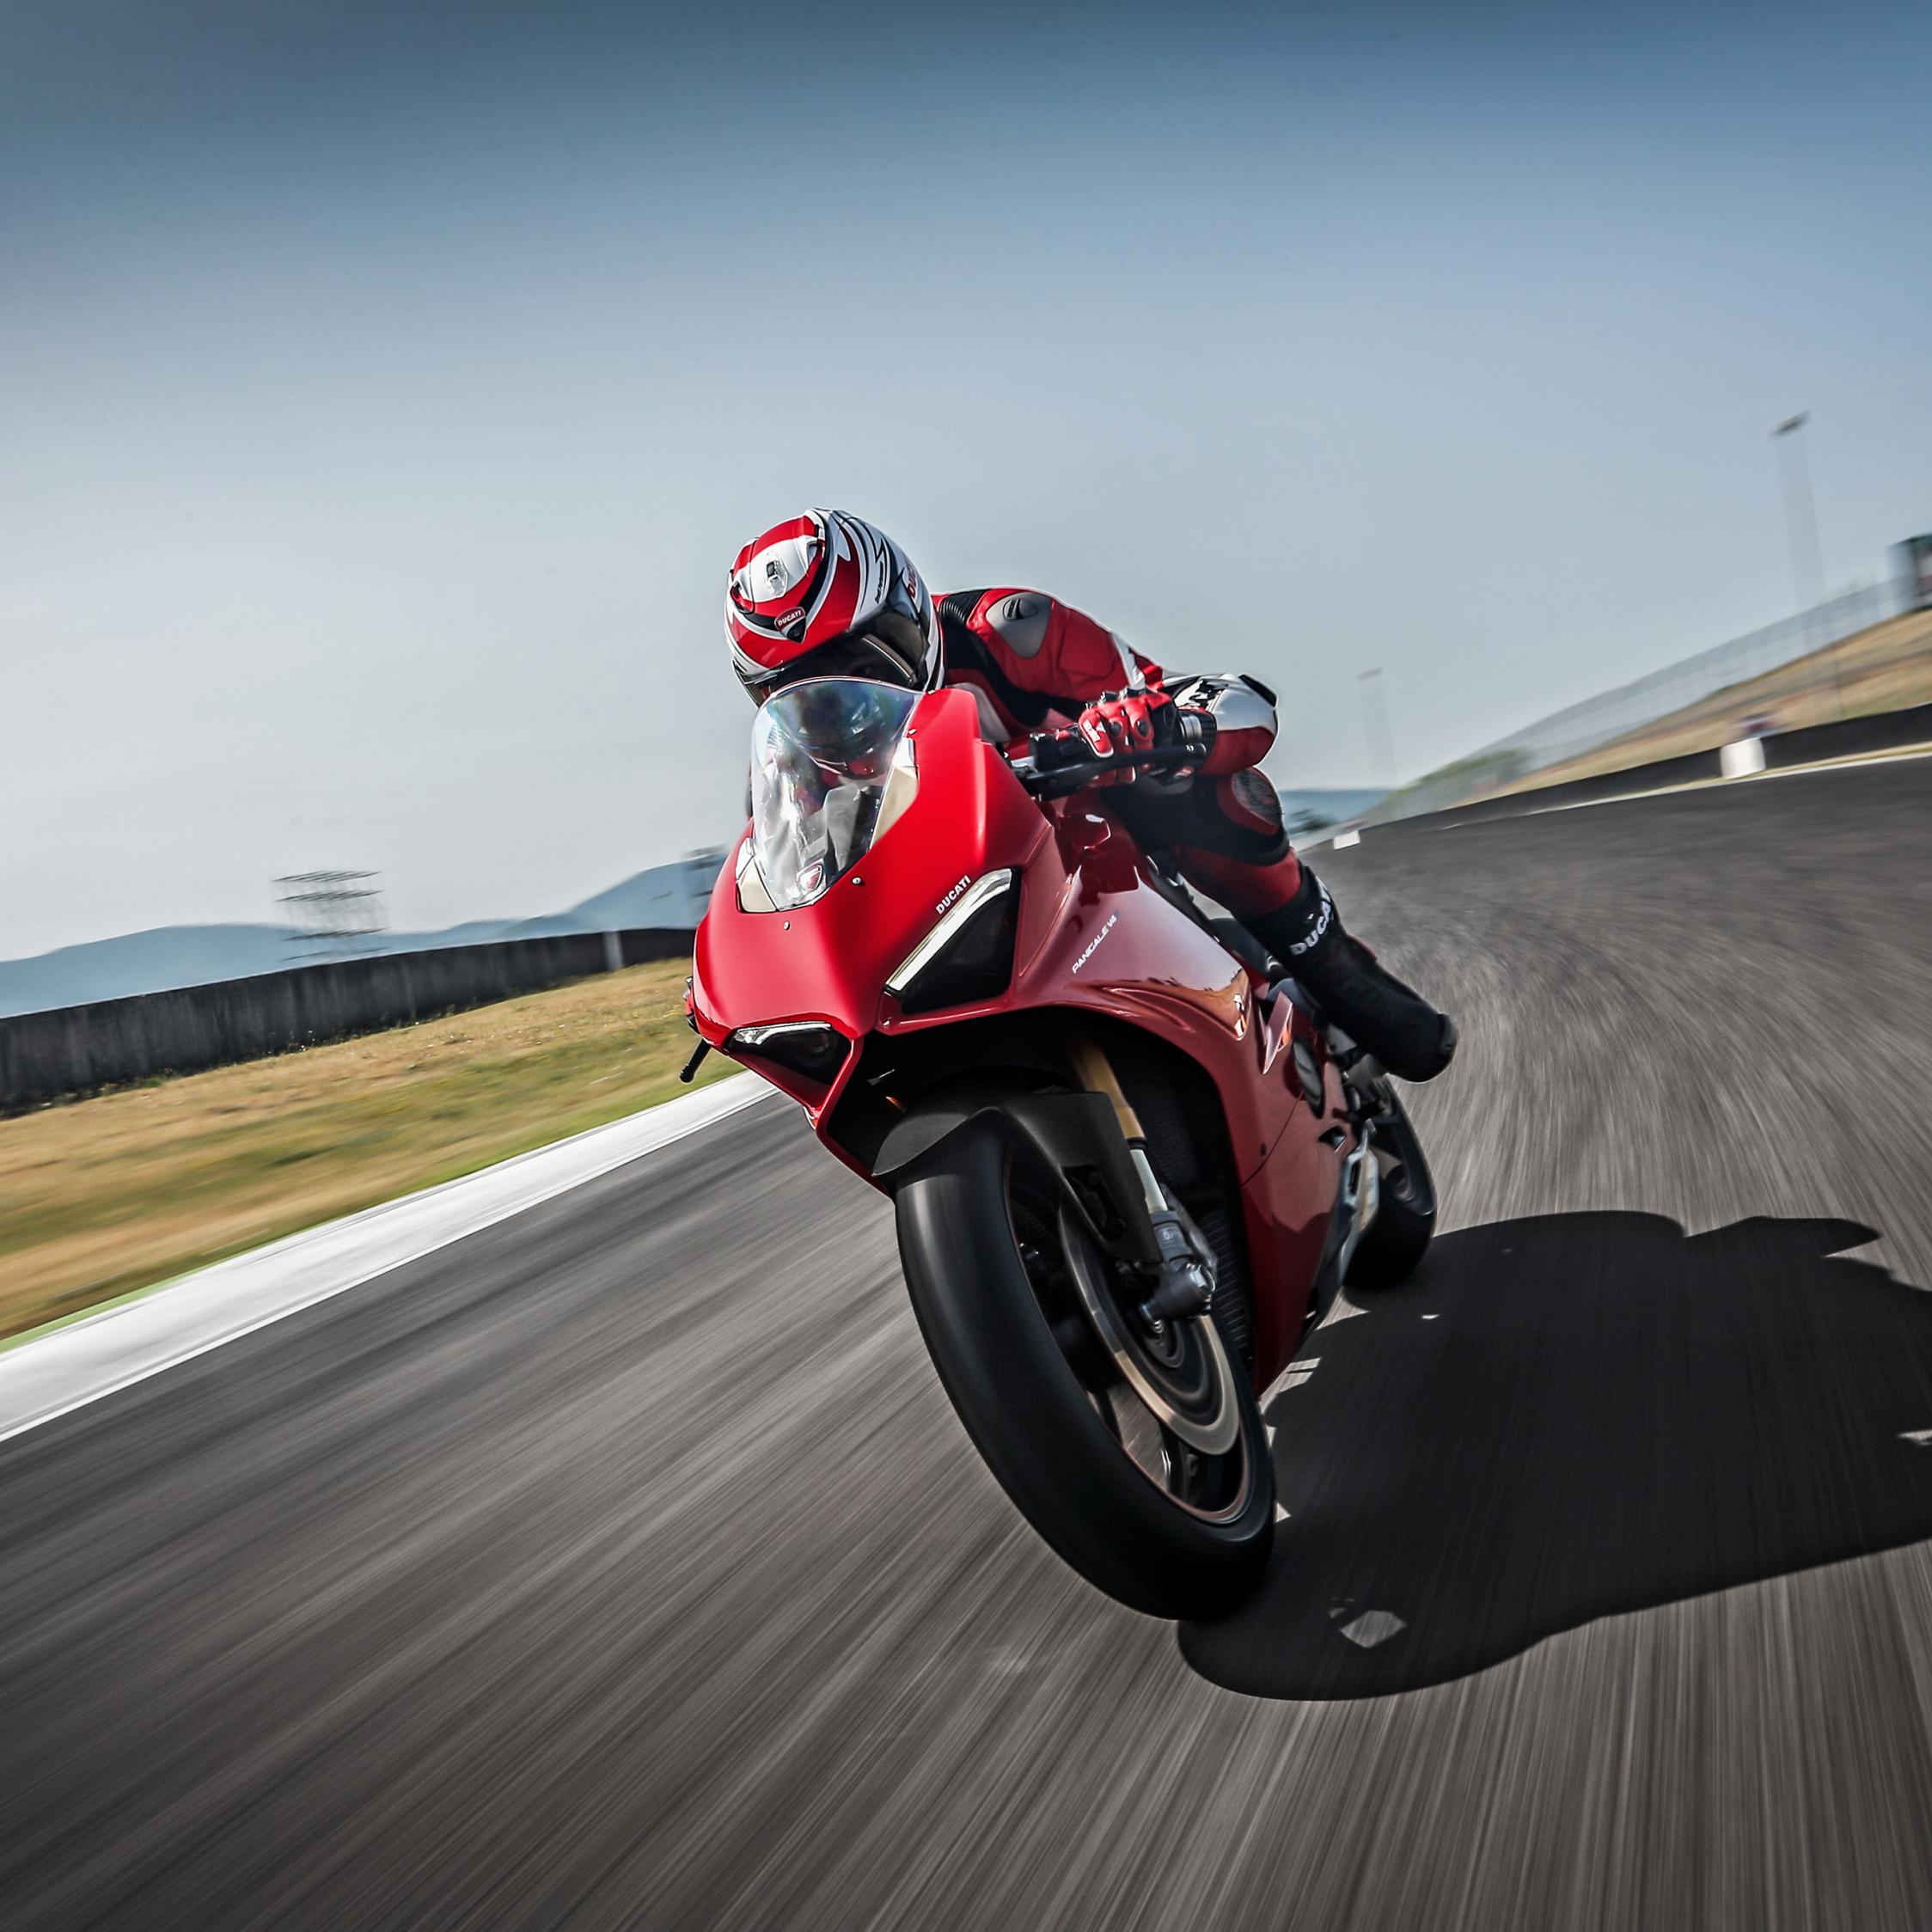 Ducati panigale v4, speciale, 2018, racing bike, 2248x2248 wallpaper